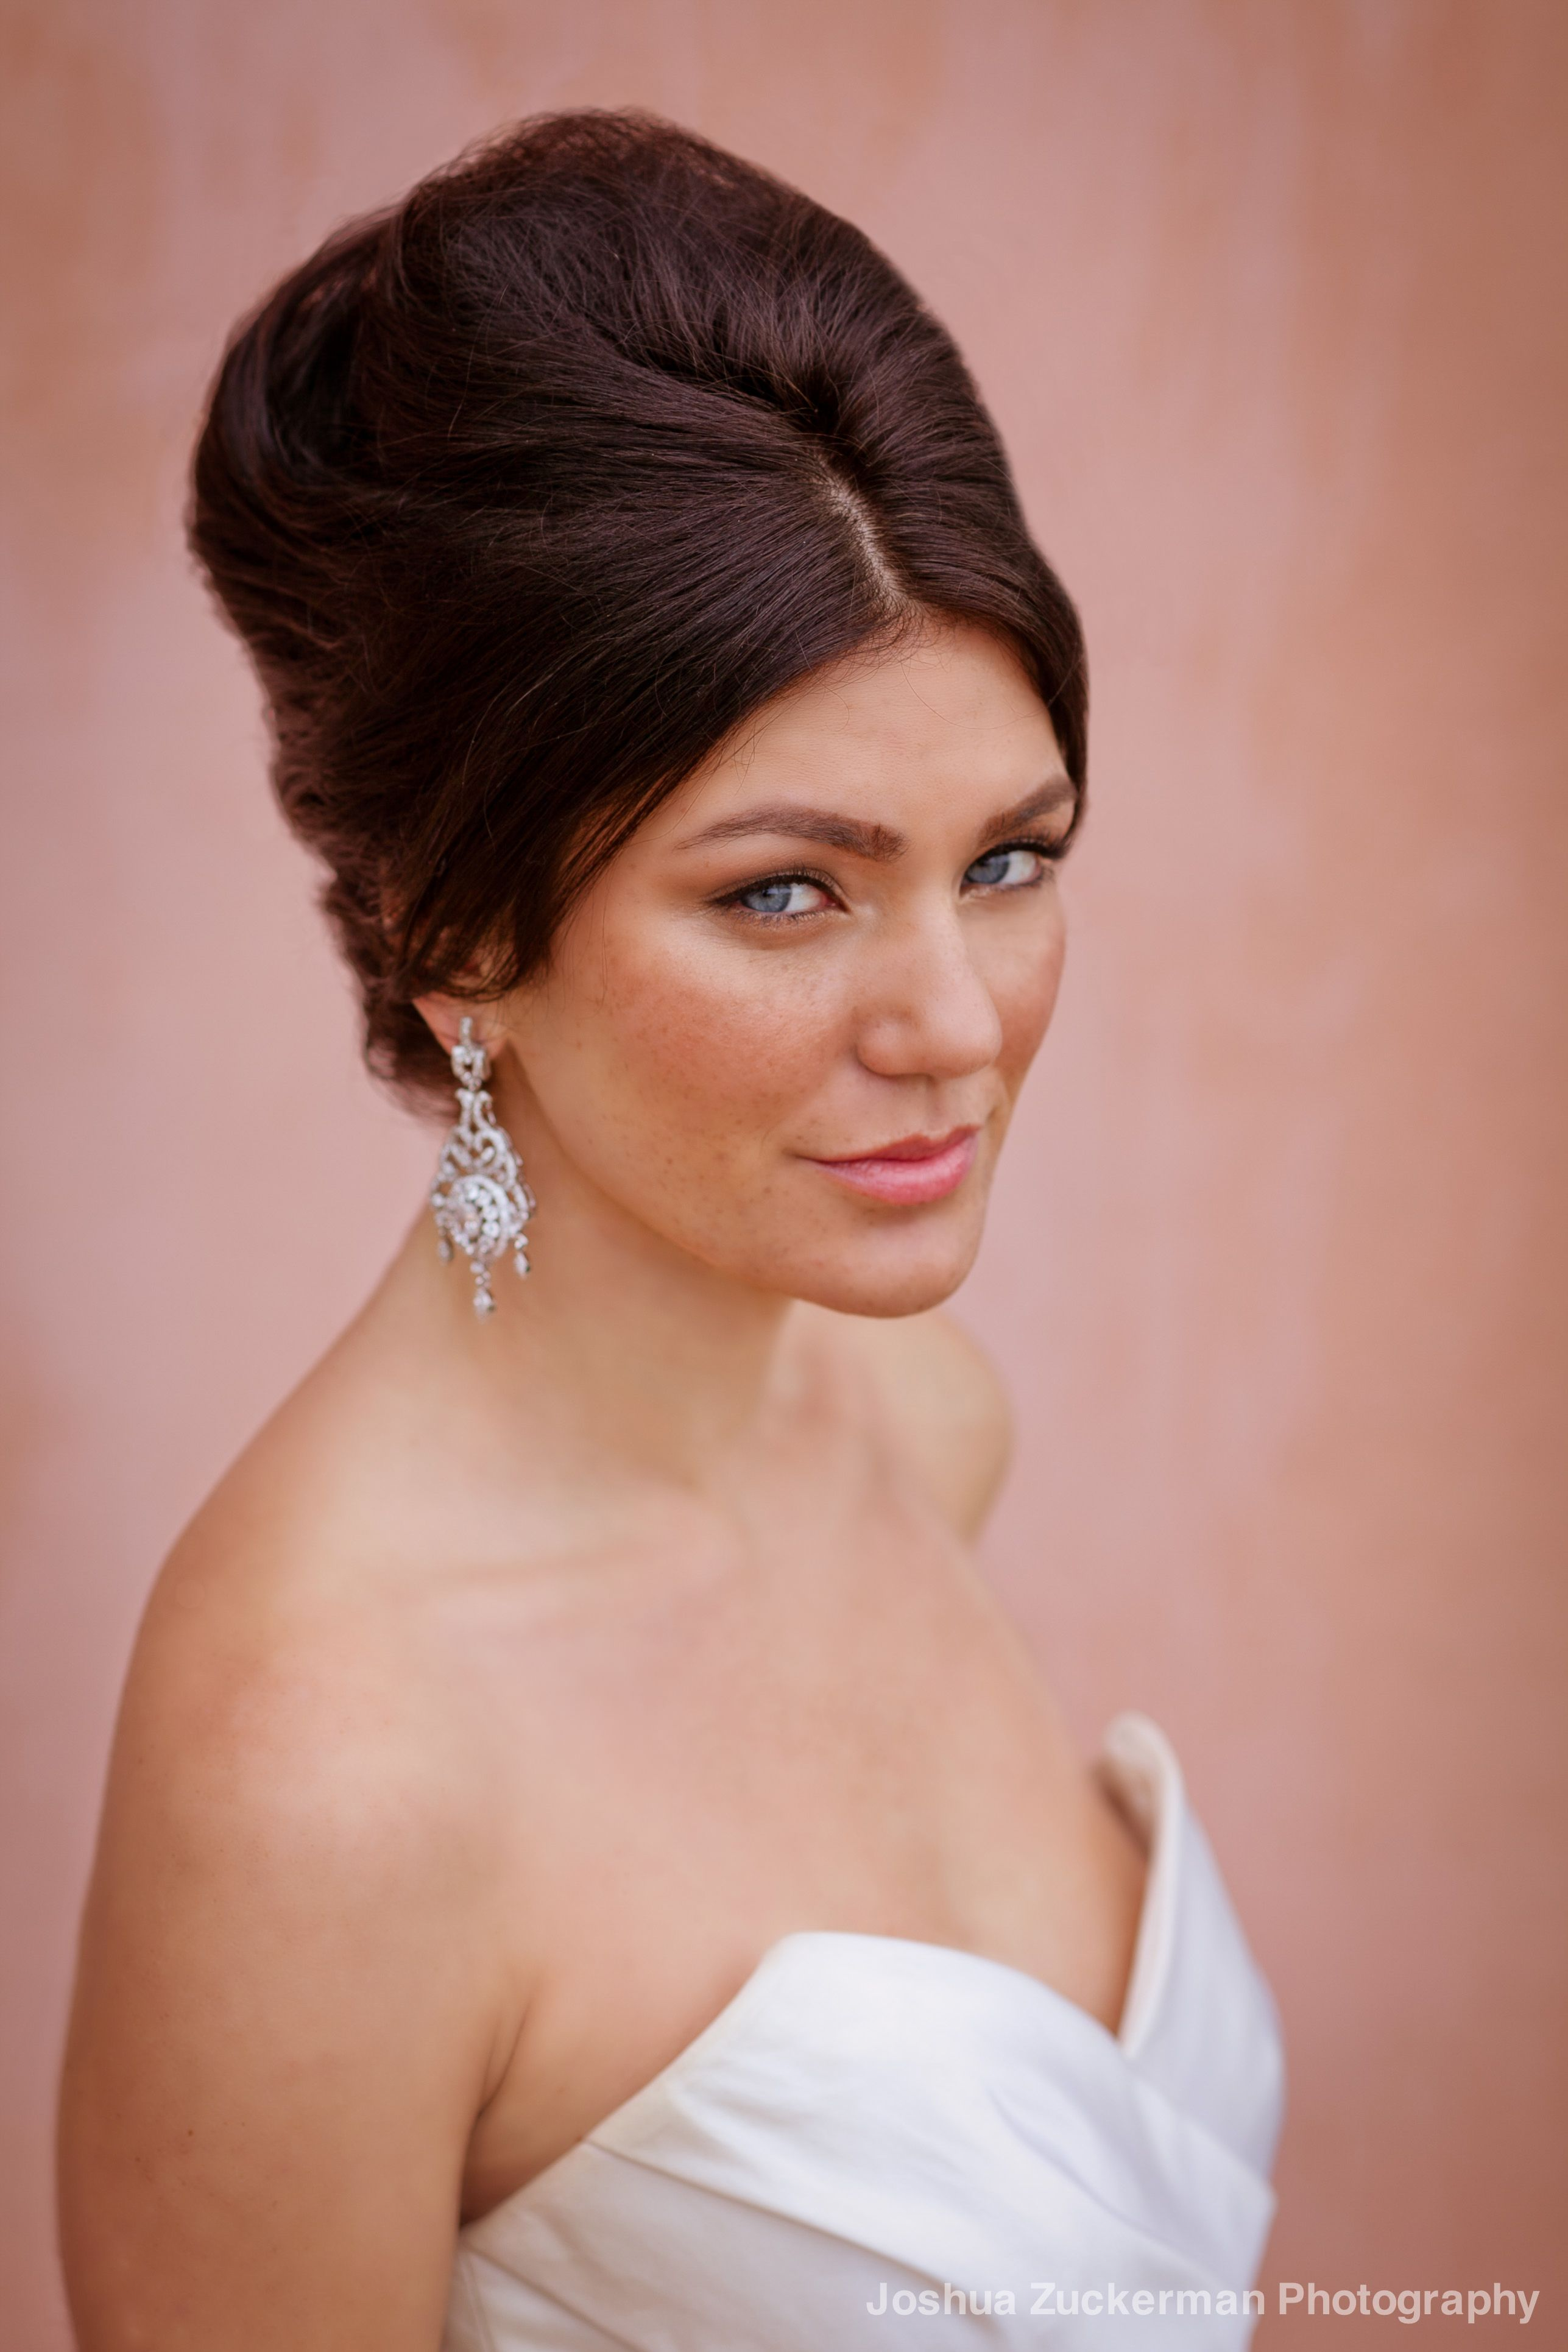 retro bride. wedding hair updo and soft, natural bridal makeup by